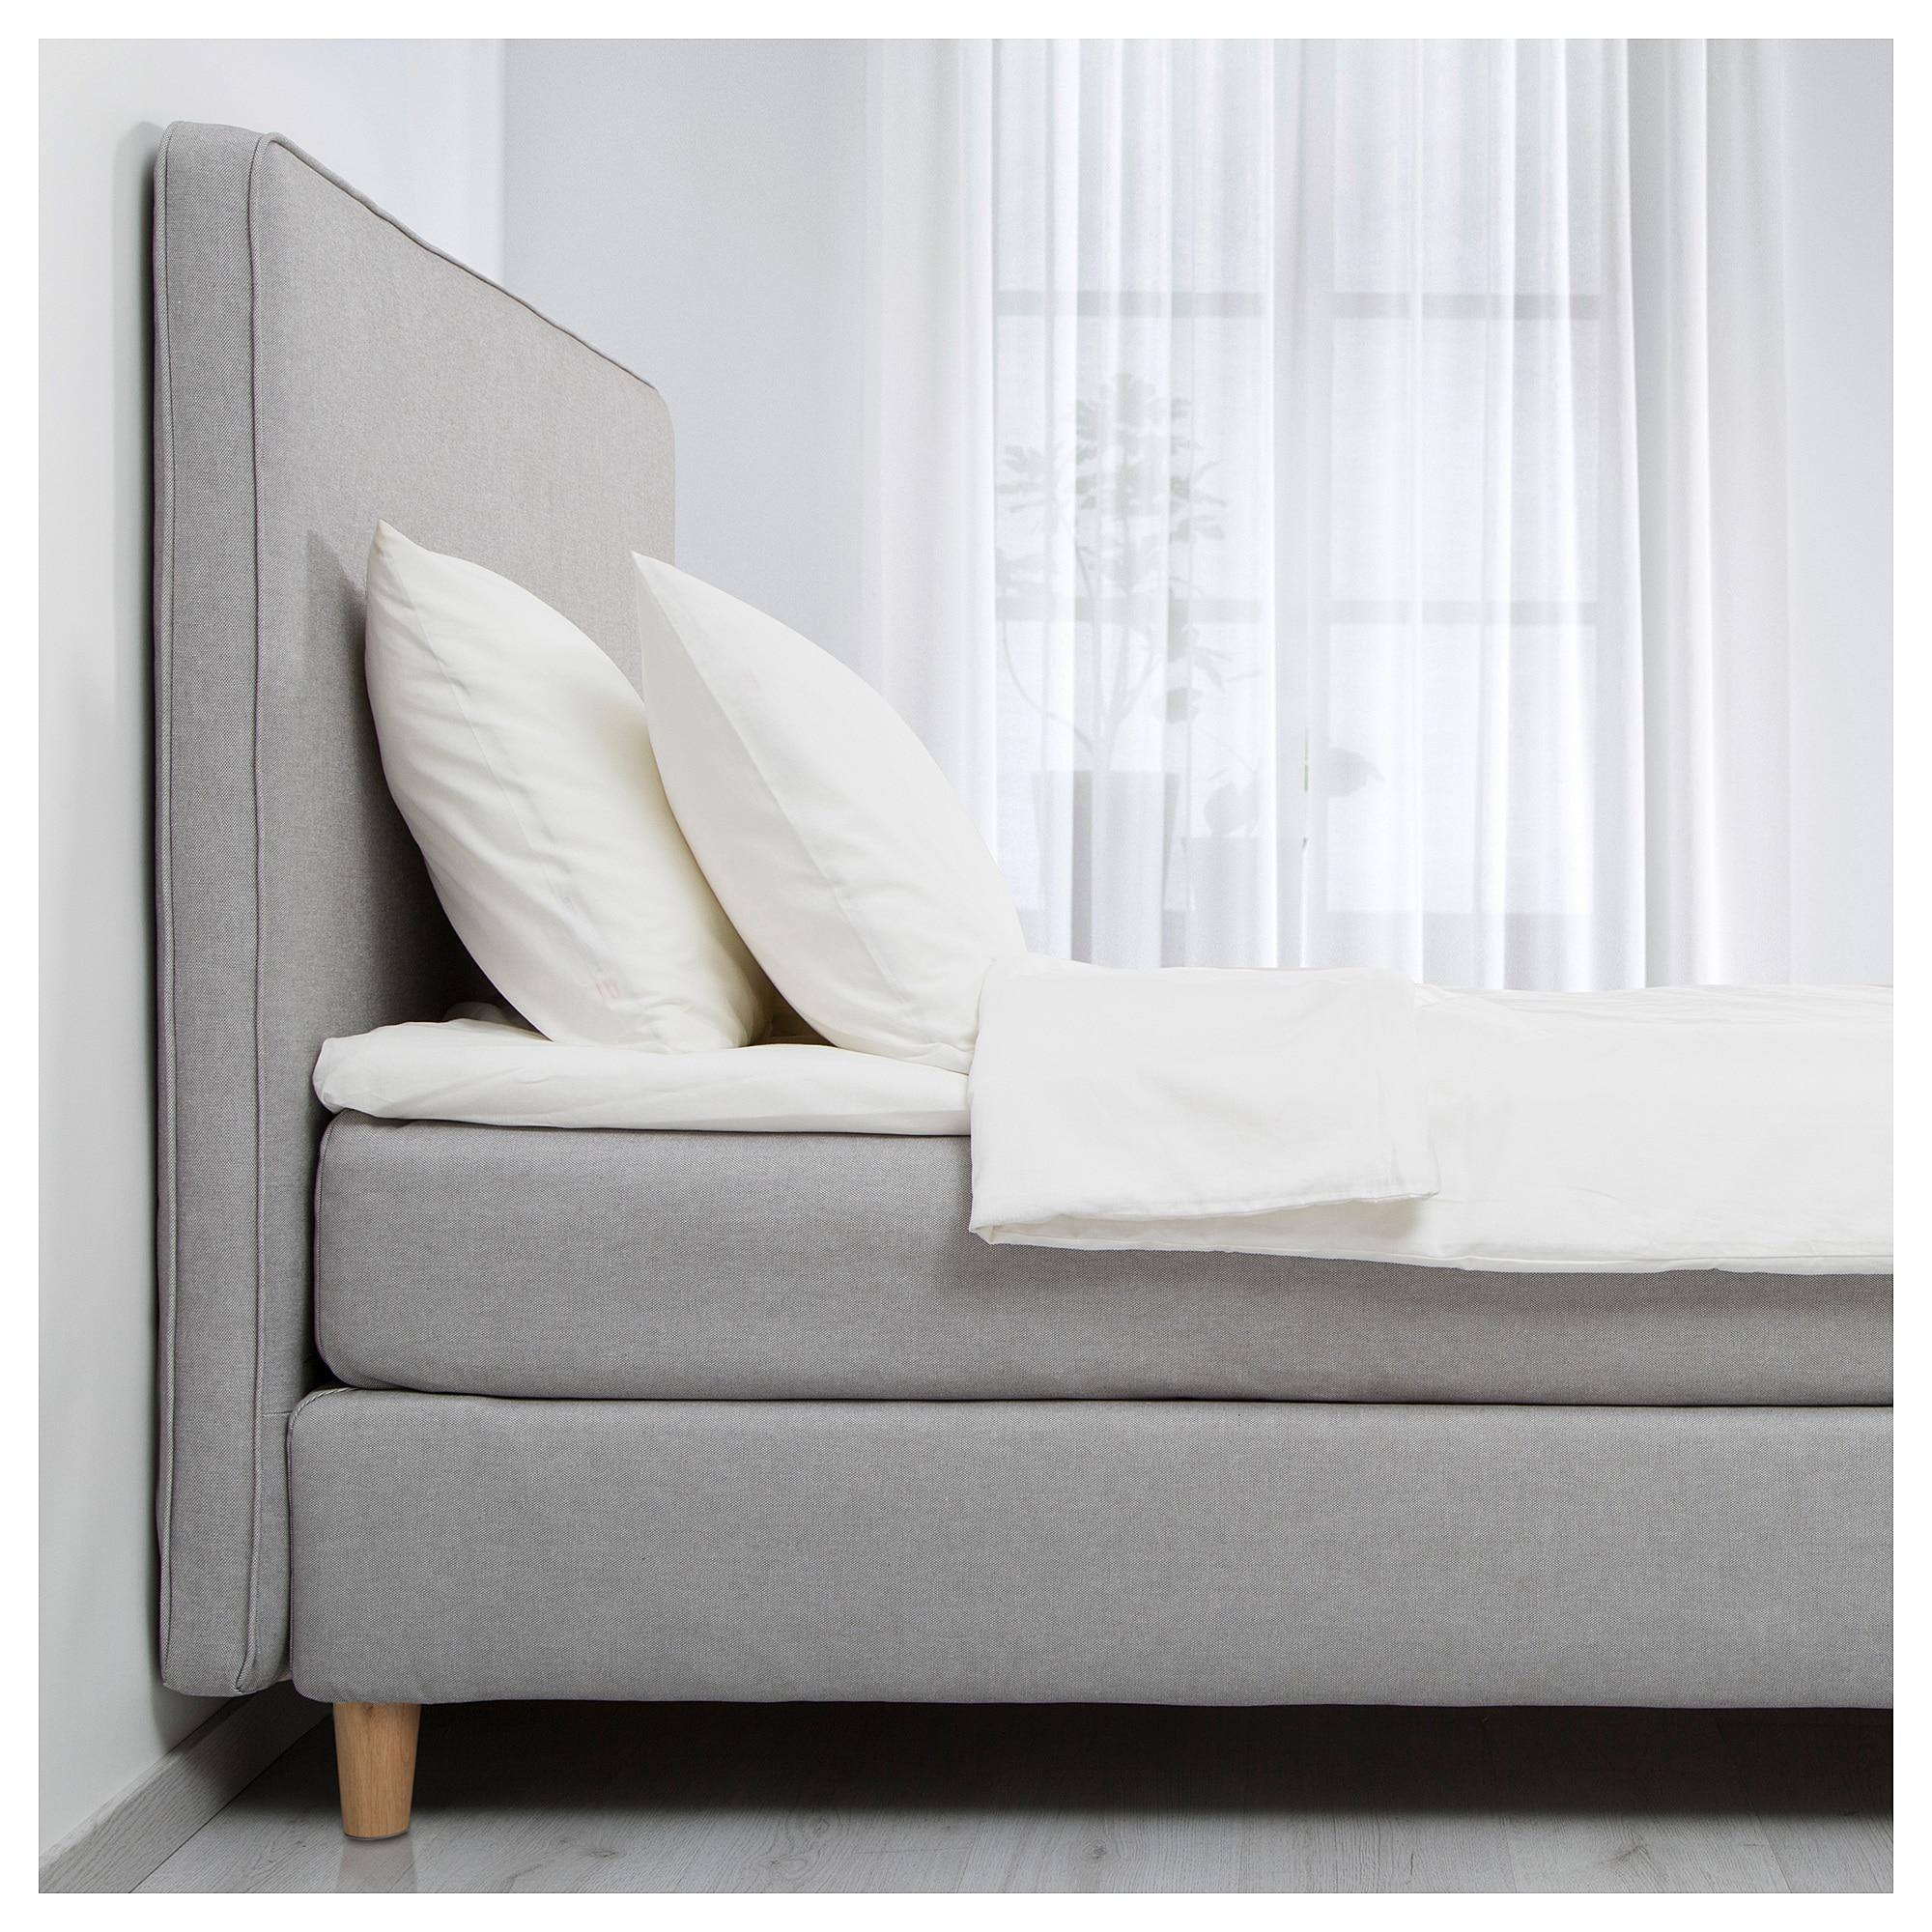 Двуспальные кровати ІКЕА